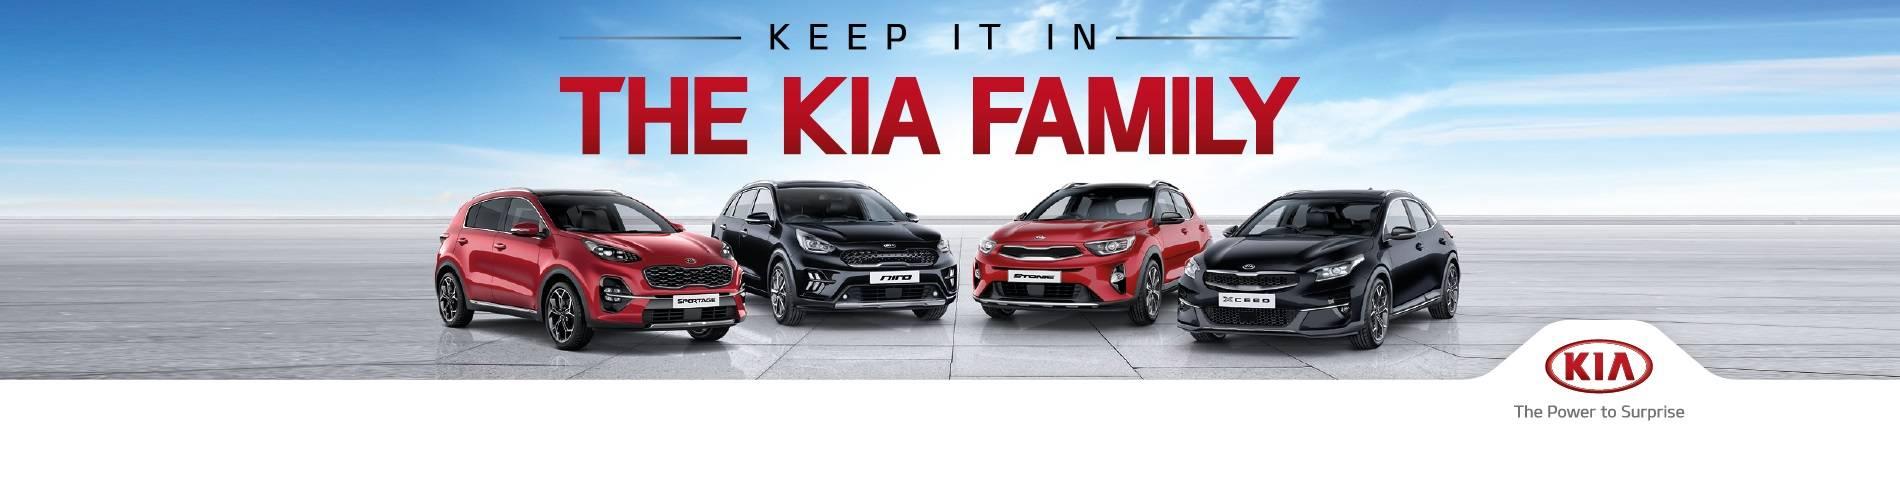 Kia Keep it in the Family